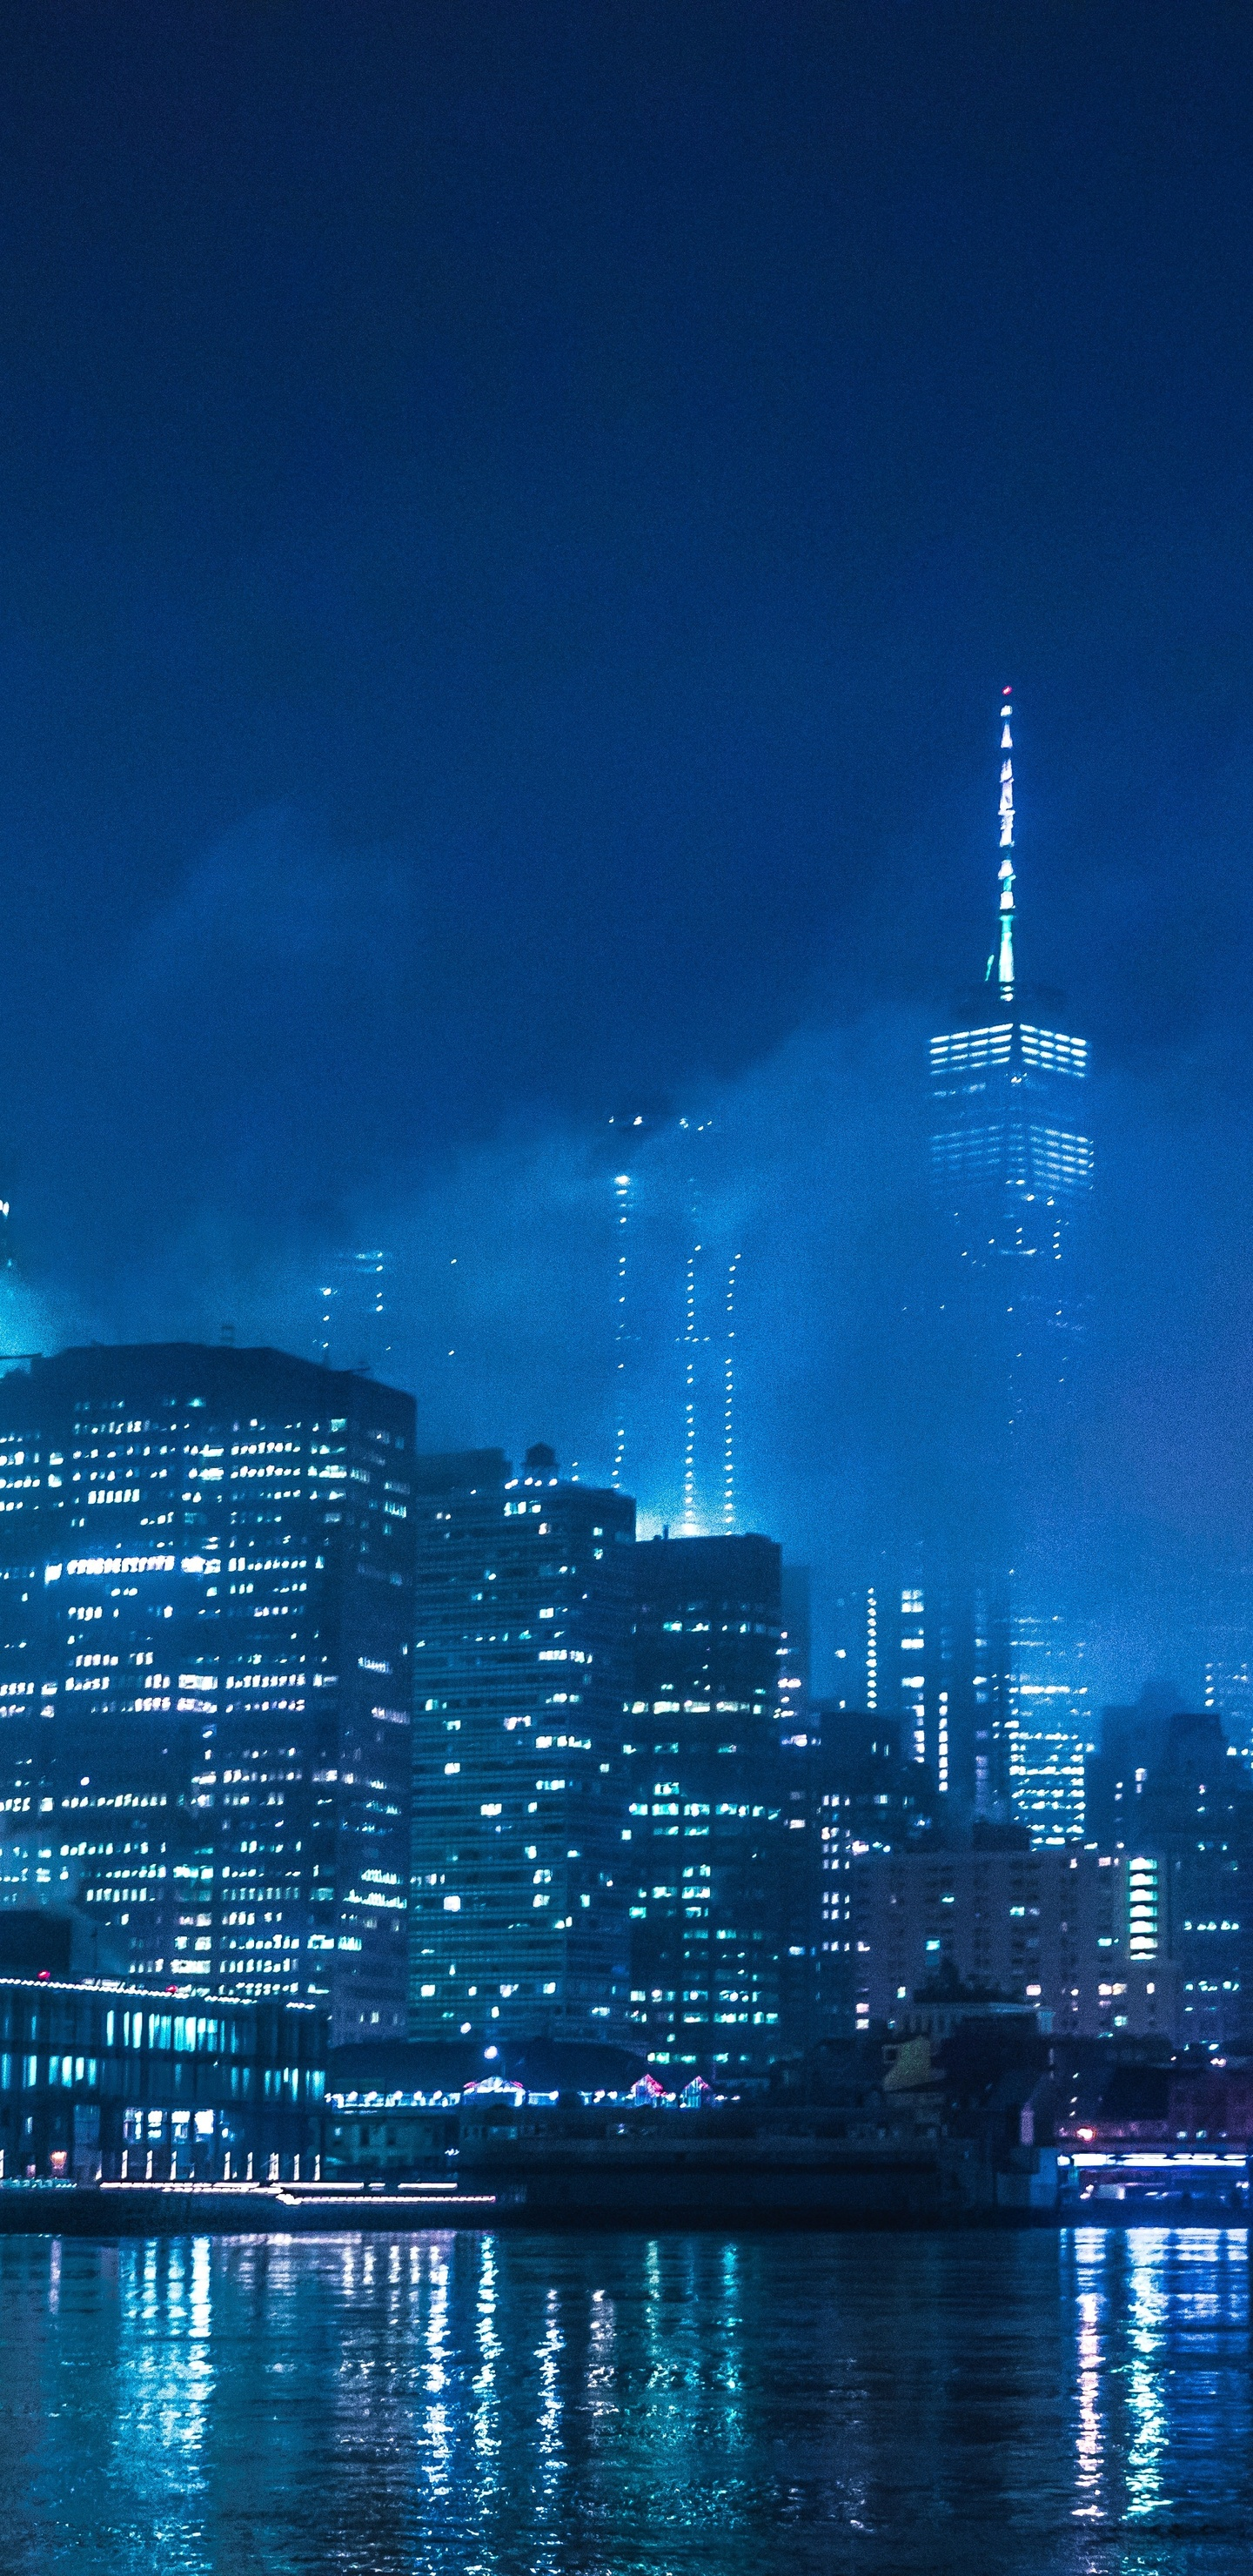 the-lights-of-new-york-4k-qp.jpg